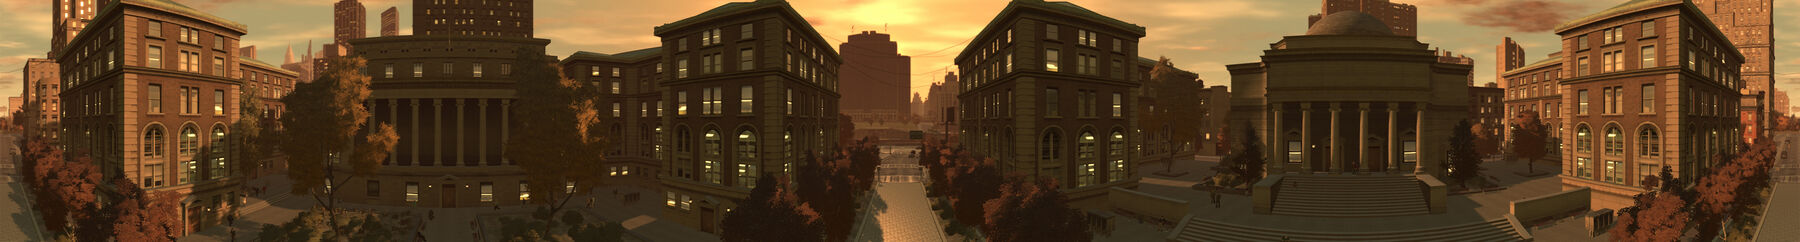 VarsityHeightsuniversity-GTA4-panorama.jpg